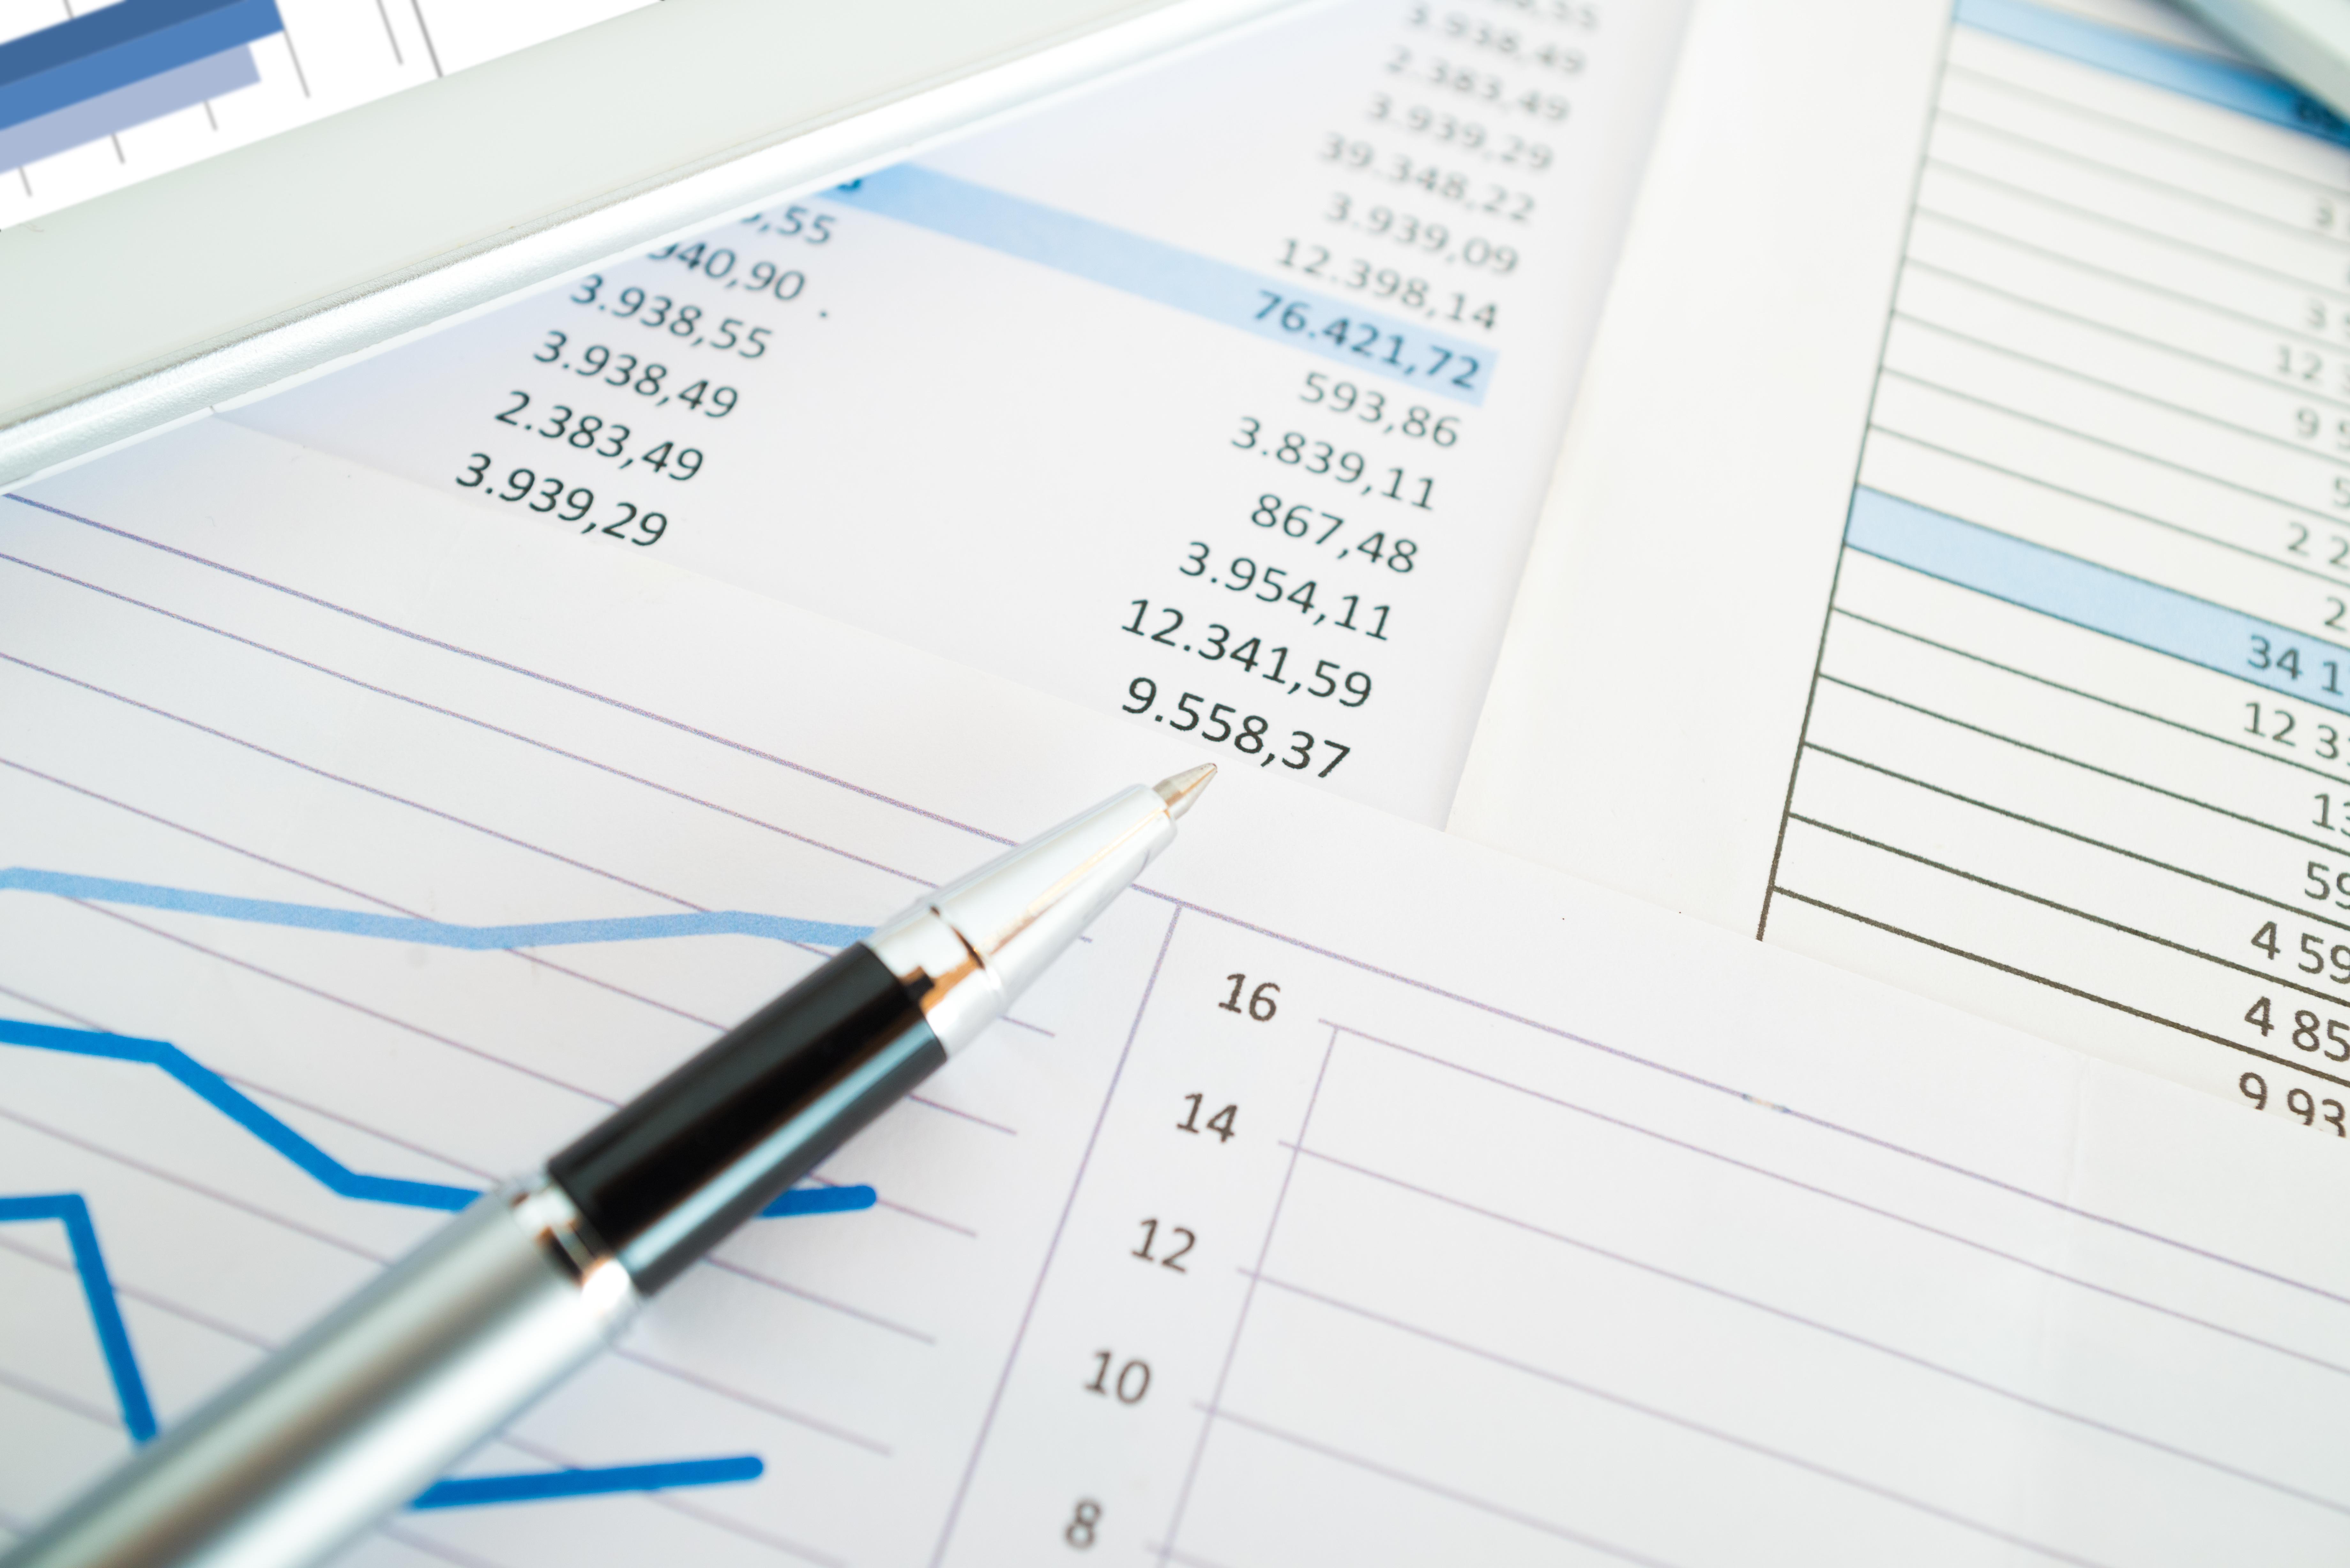 ITFM data planning